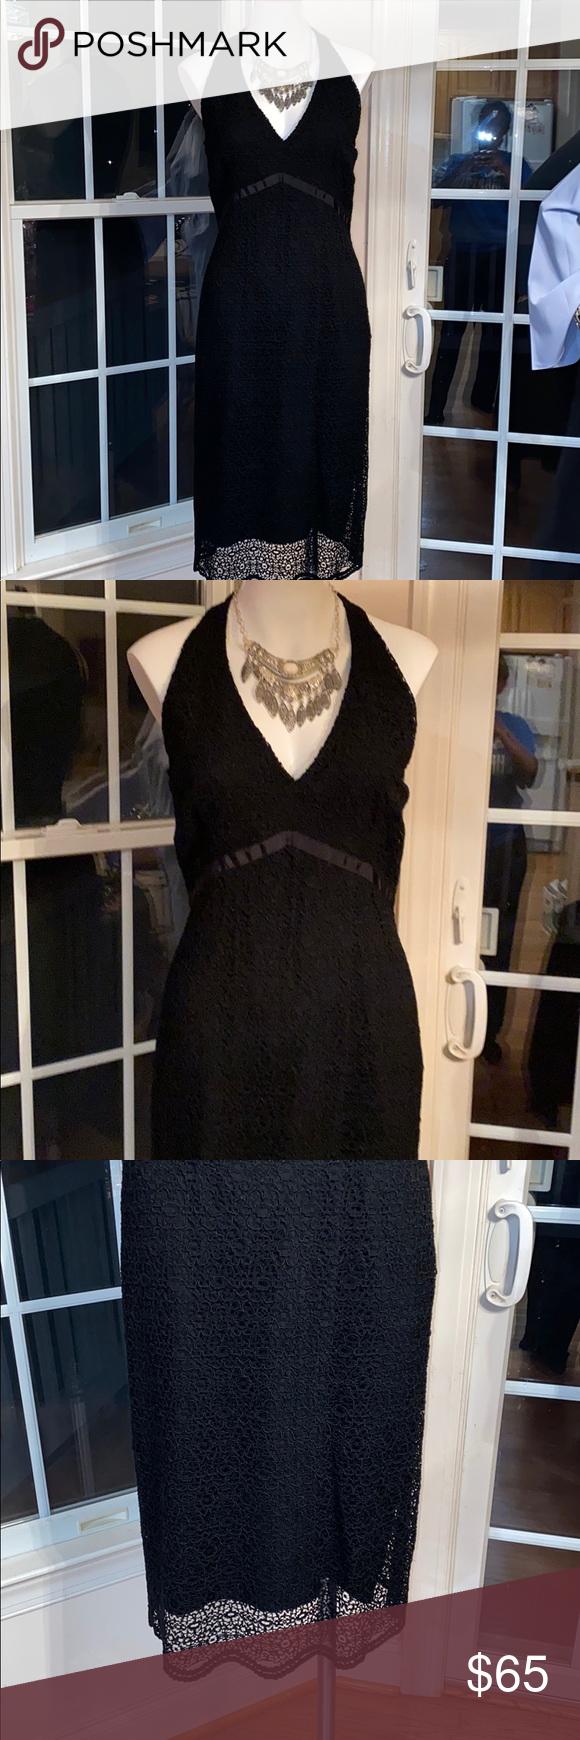 Elie Tahari Black Lace Dress Black Lace Dress Dresses Lace Dress [ 1740 x 580 Pixel ]